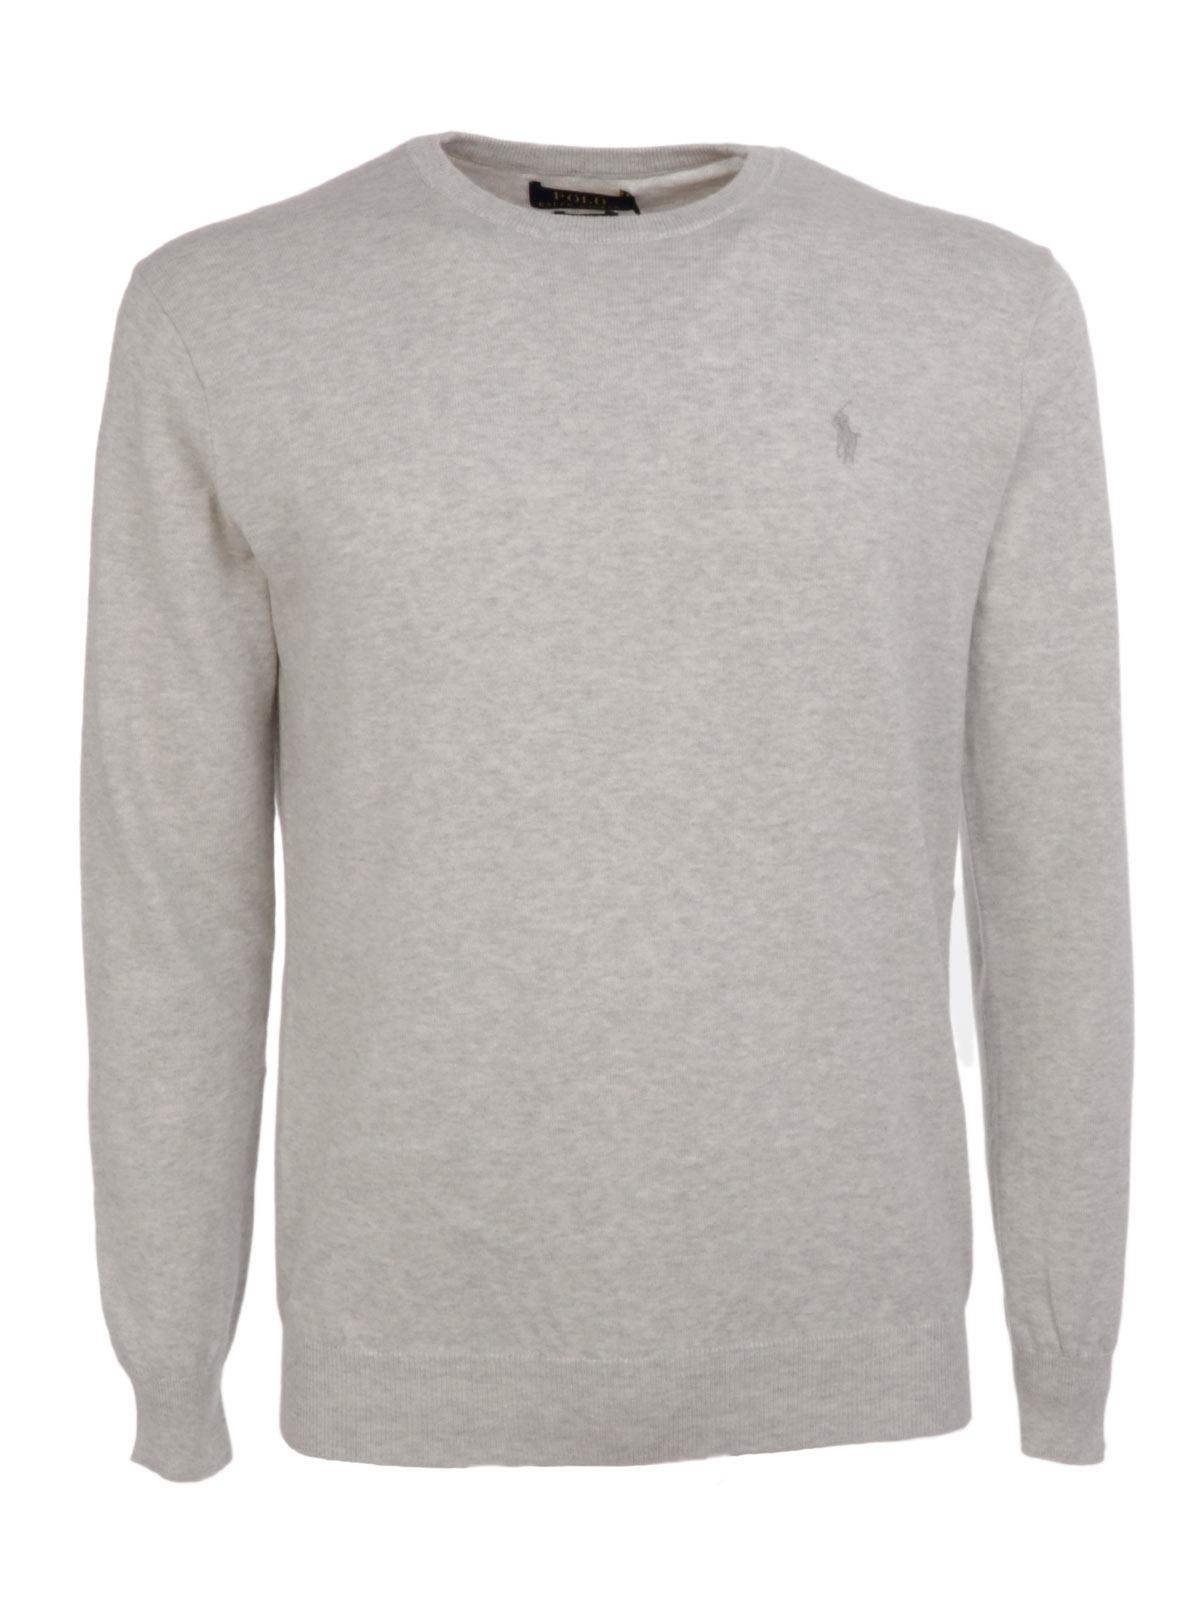 a93747817 POLO RALPH LAUREN Men s Crewneck Sweater Grey Htr